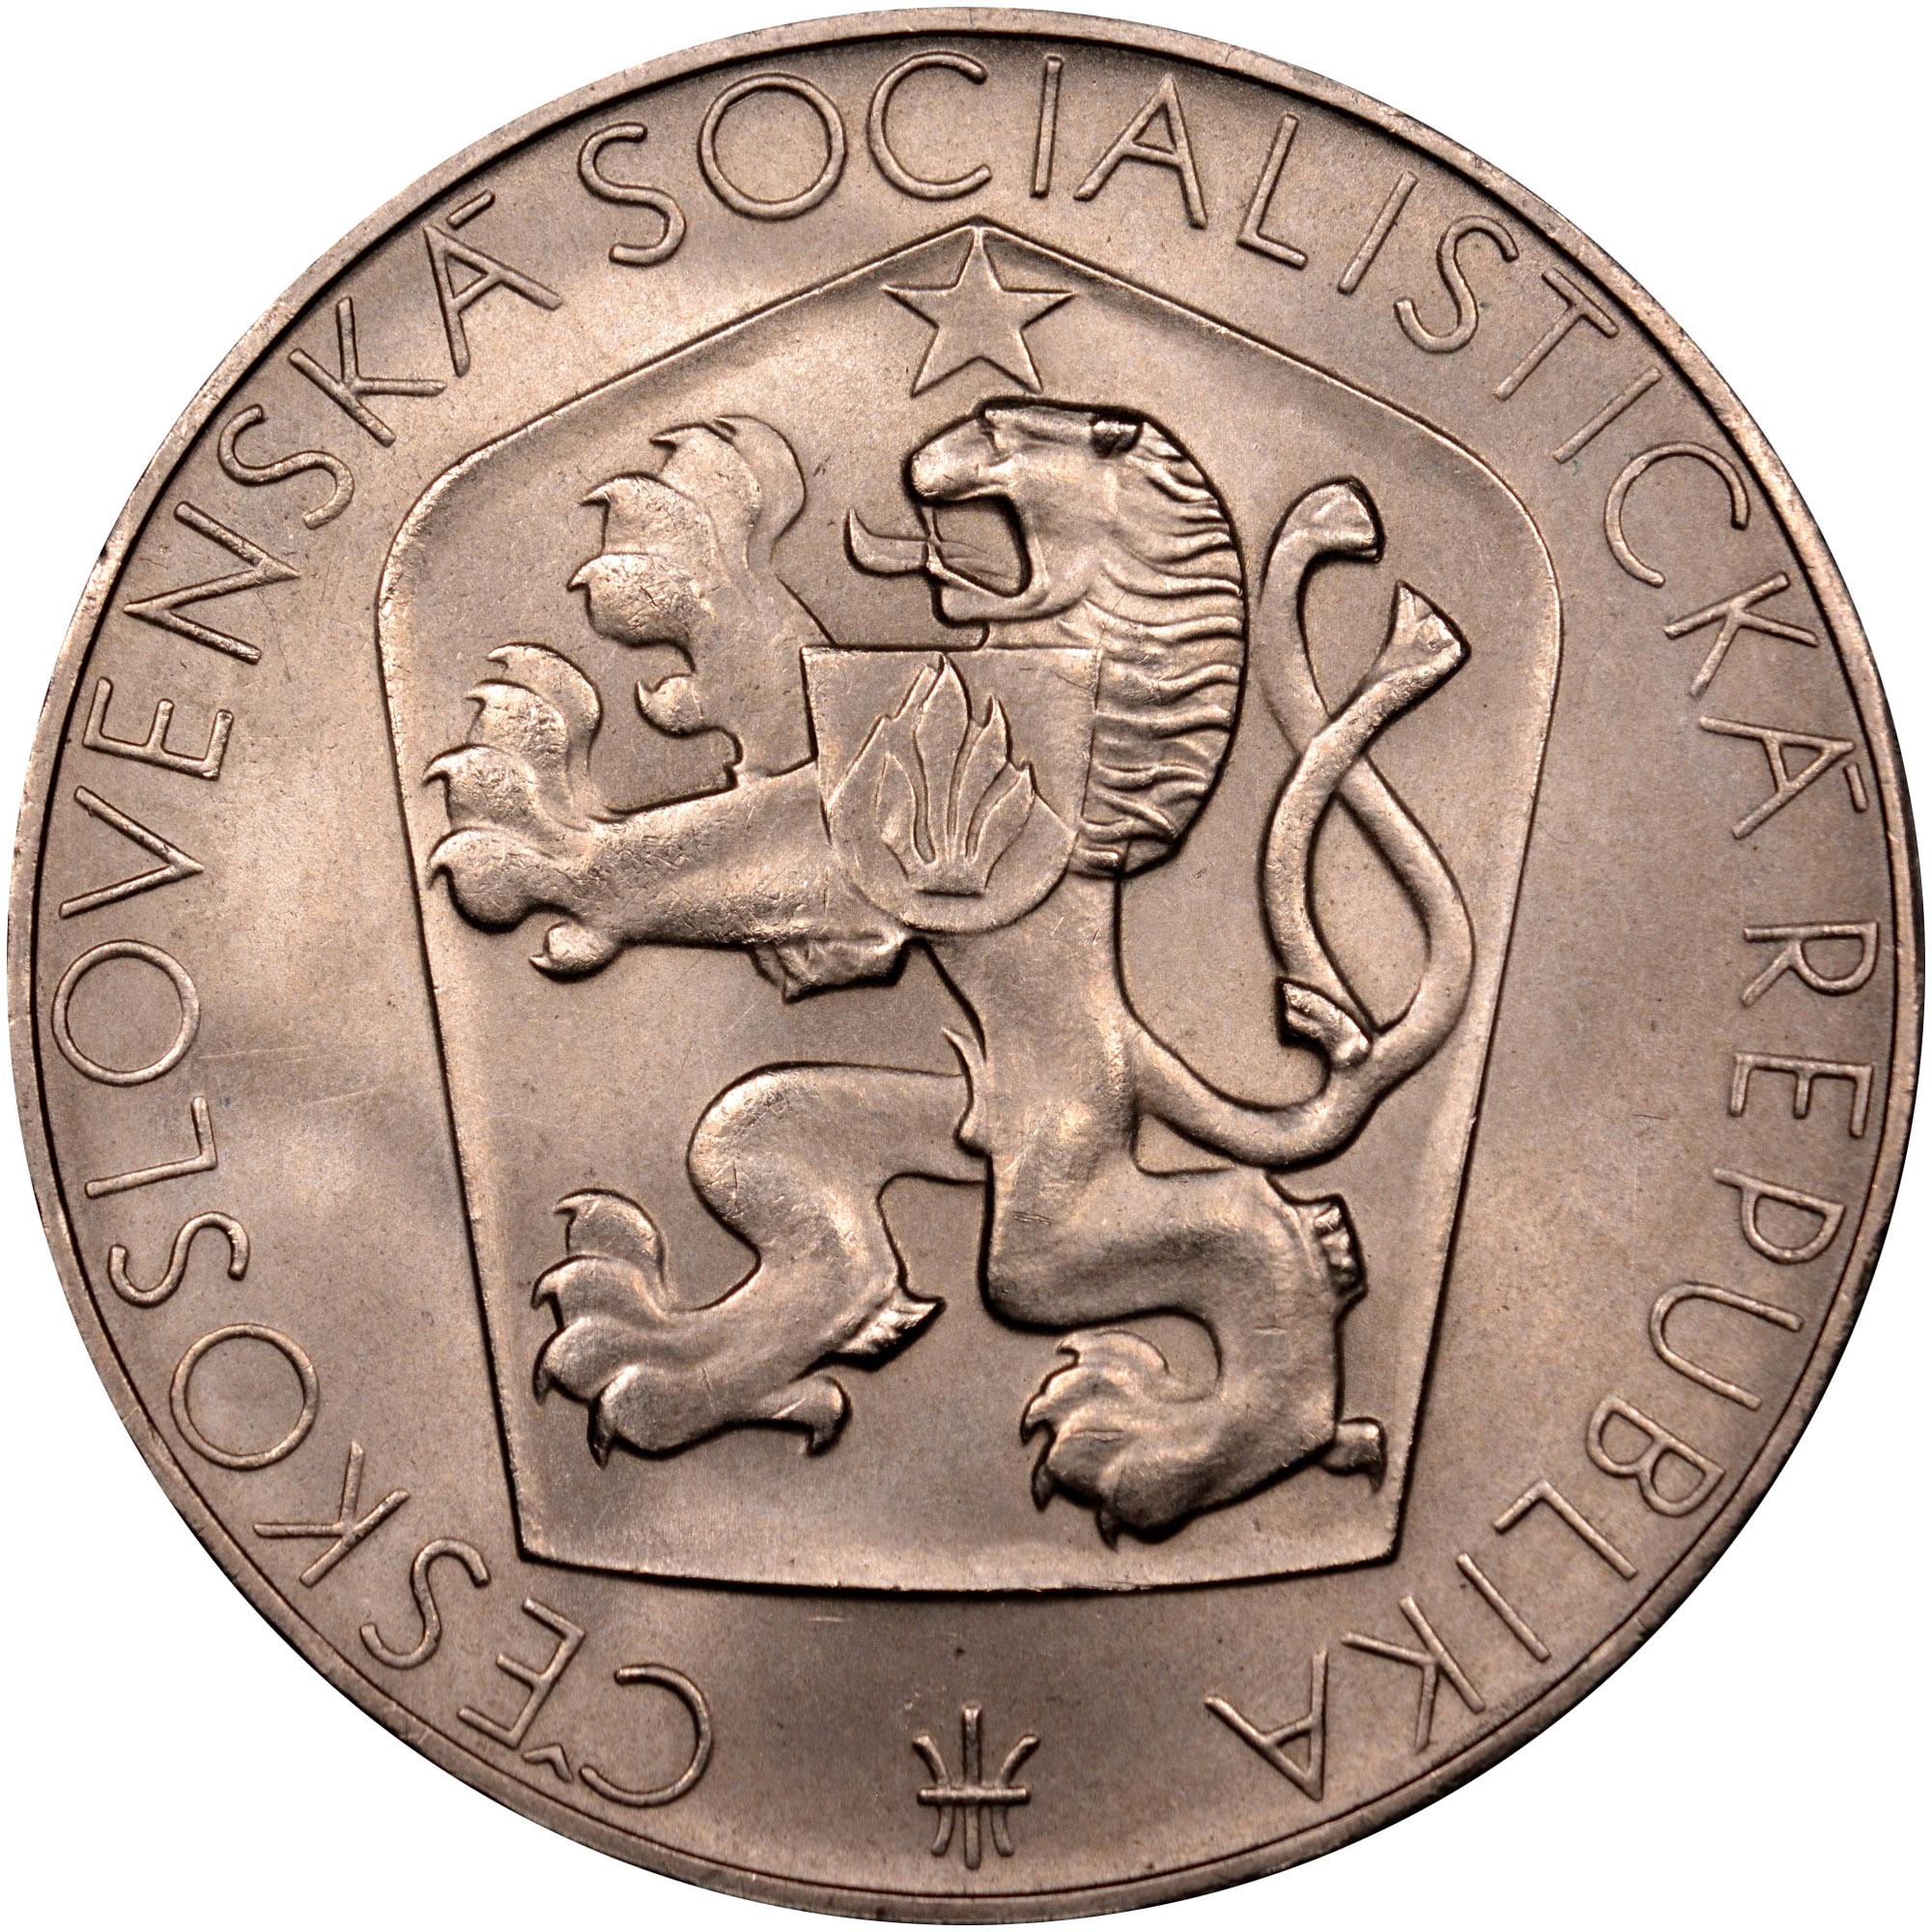 (1965) Czechoslovakia 25 Korun obverse